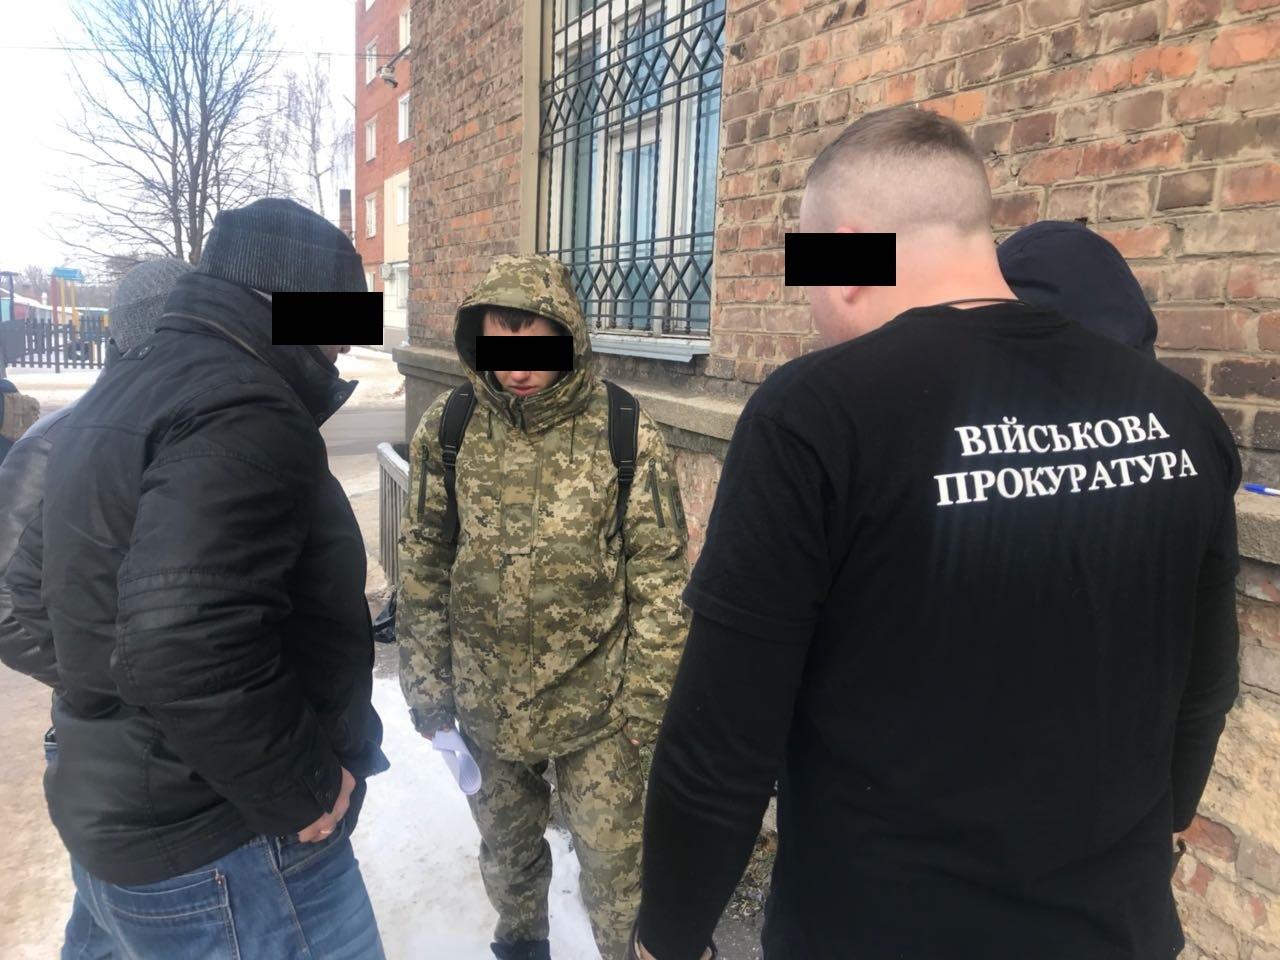 novina-26-02-2018-1-1